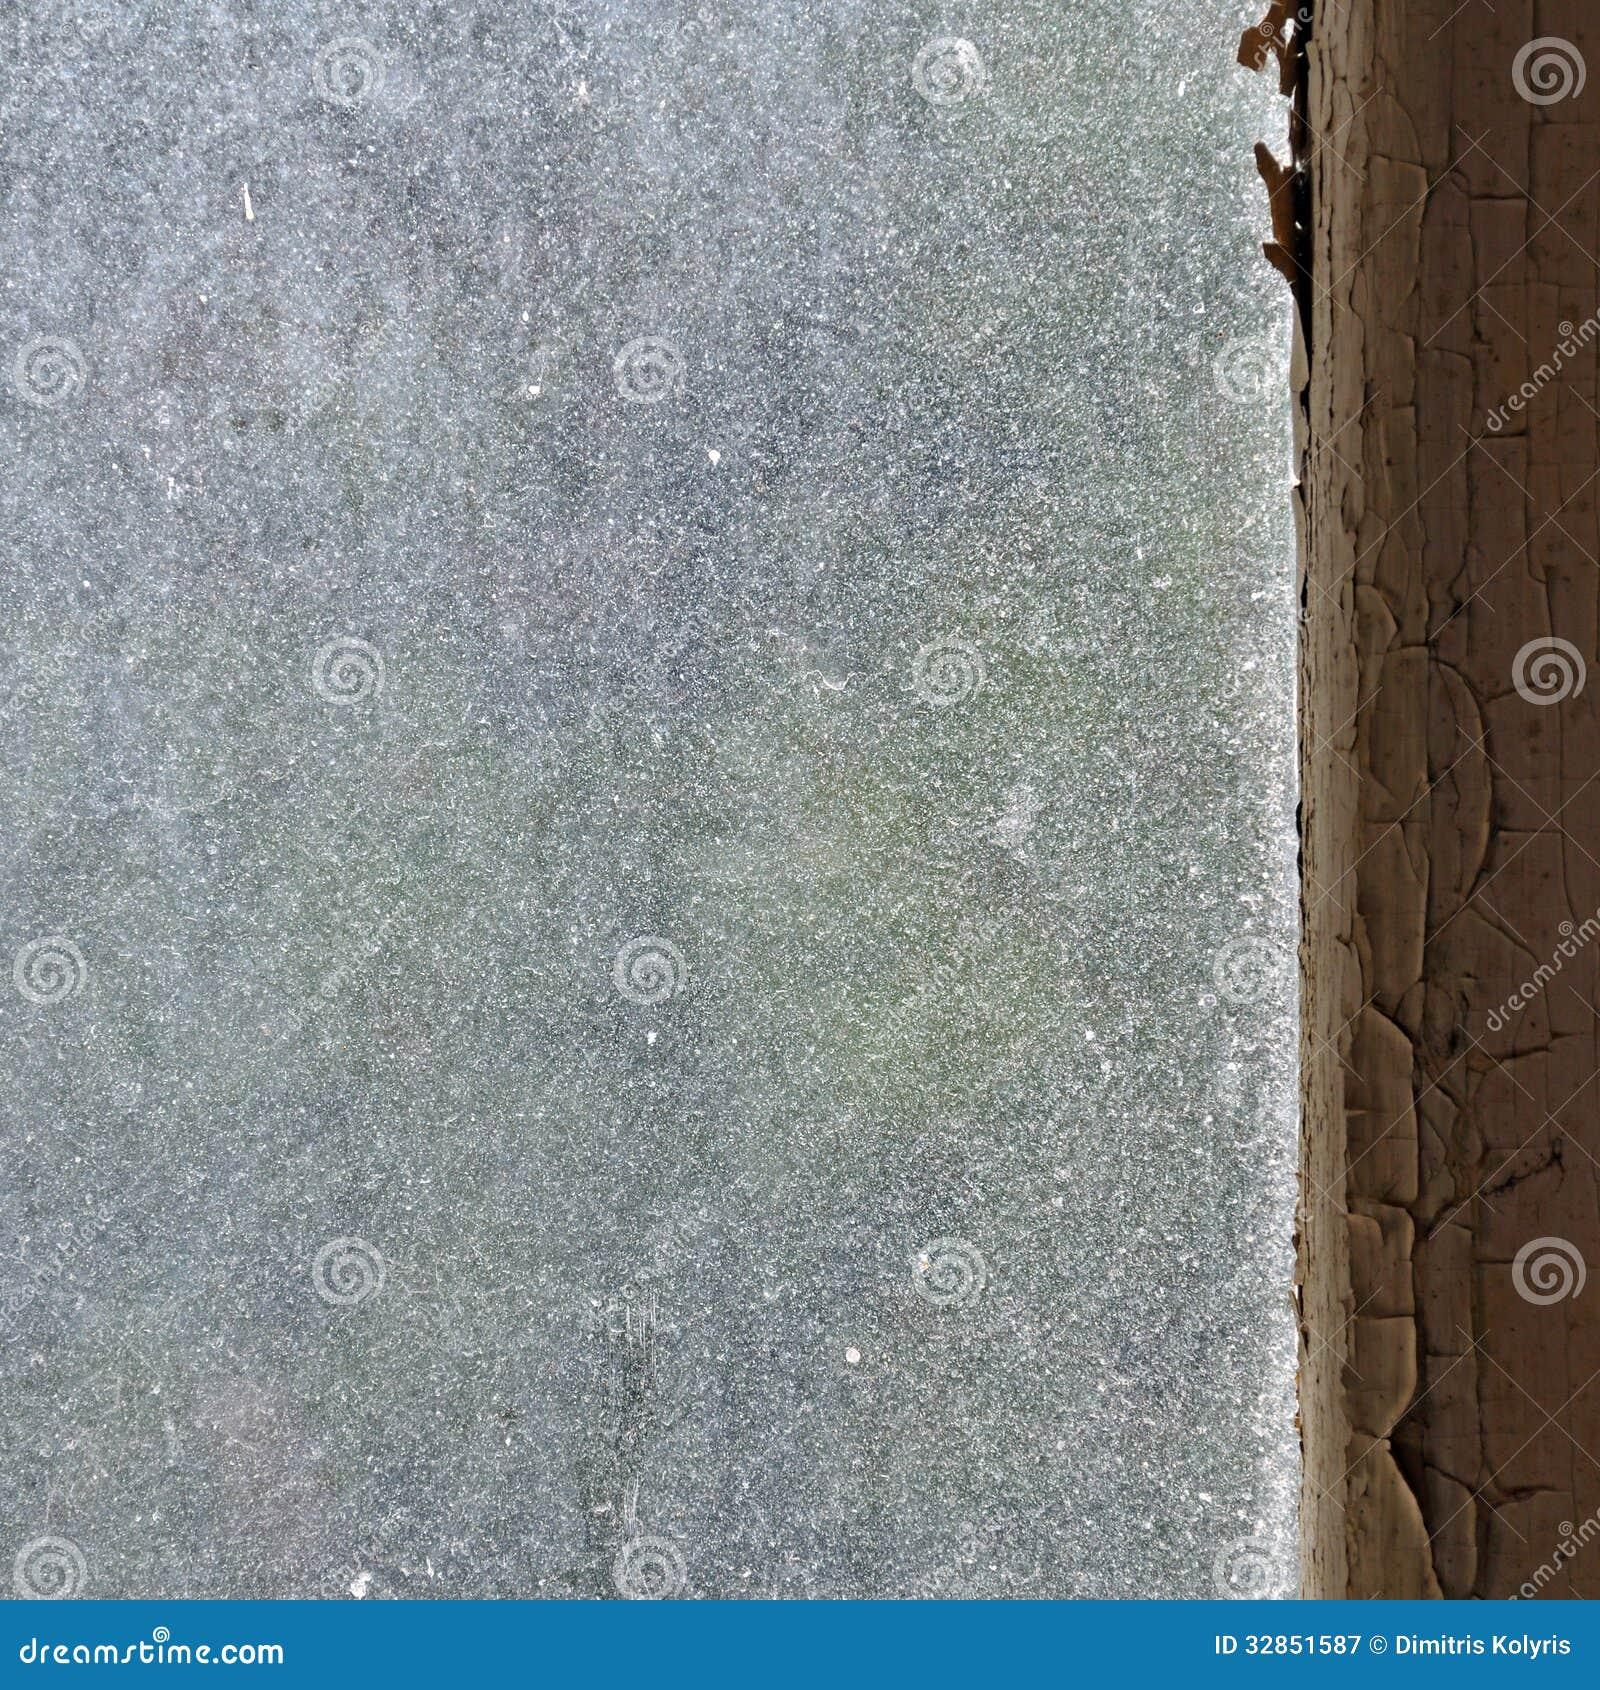 Dusty Window Glass Stock Image Image Of Flaking Minimal